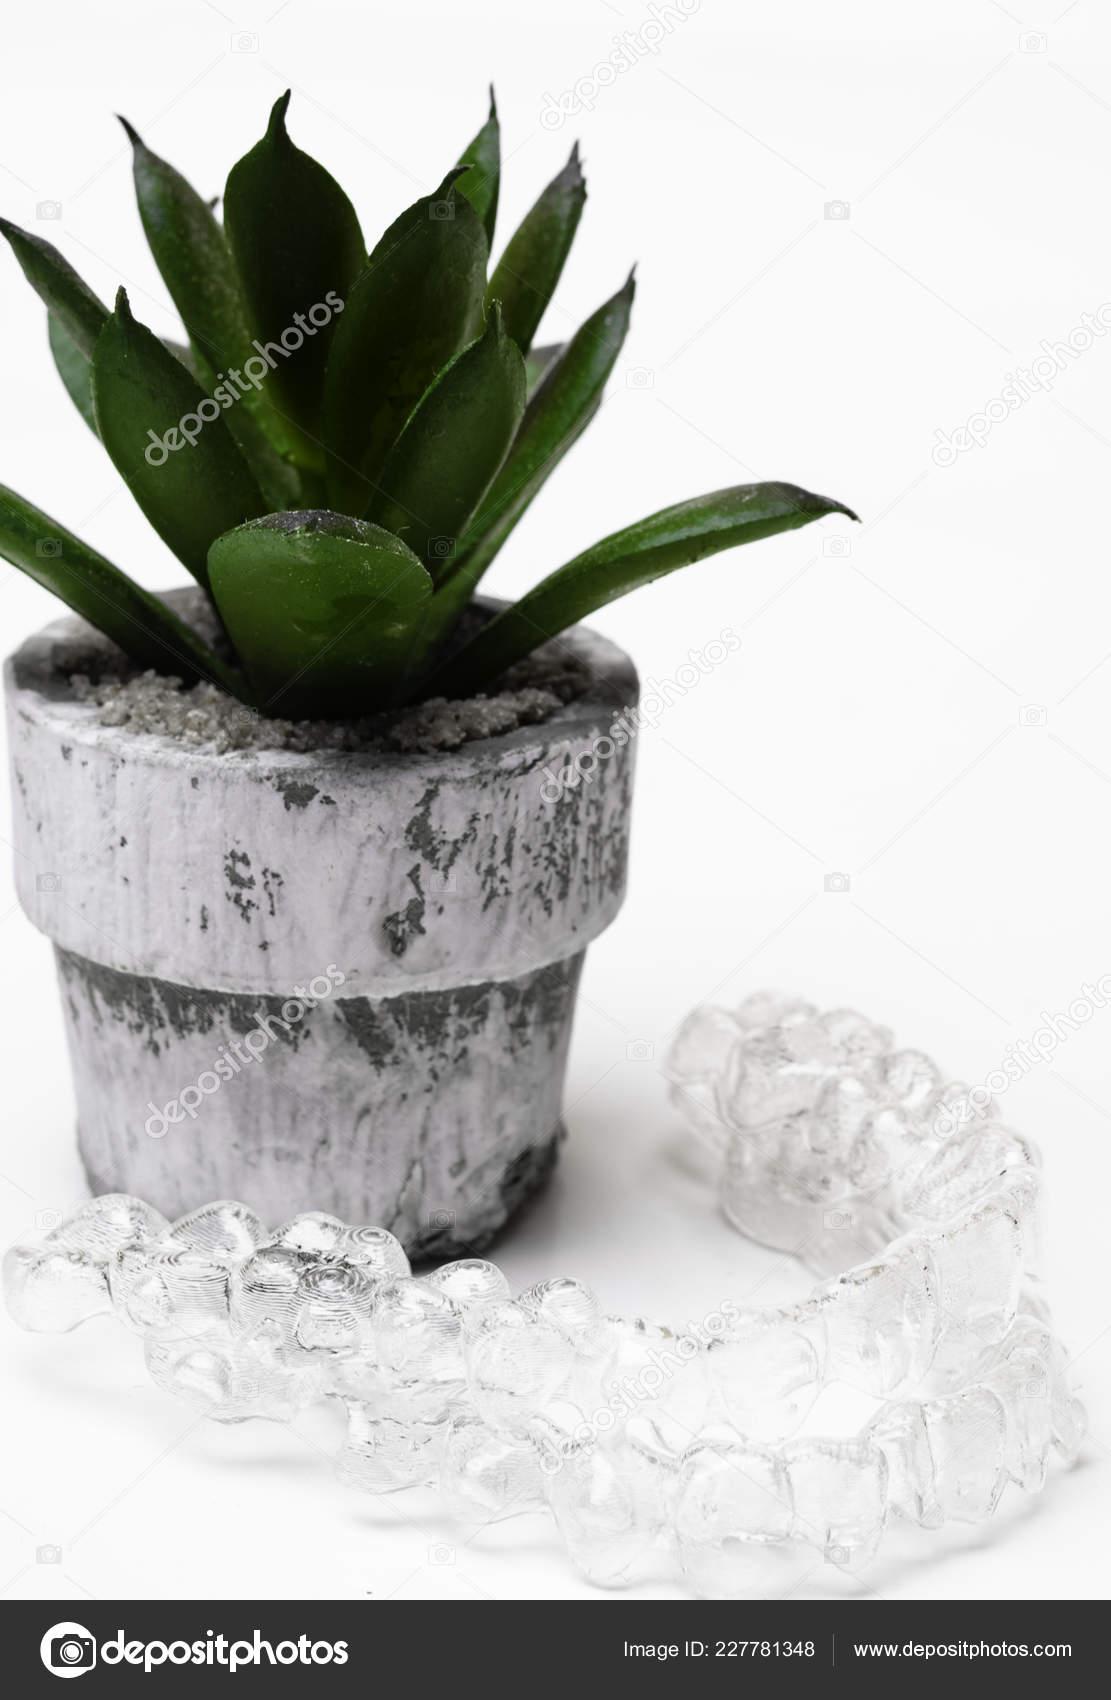 Invisible Aligner Decorative Cactus Pot White Background Copy Space